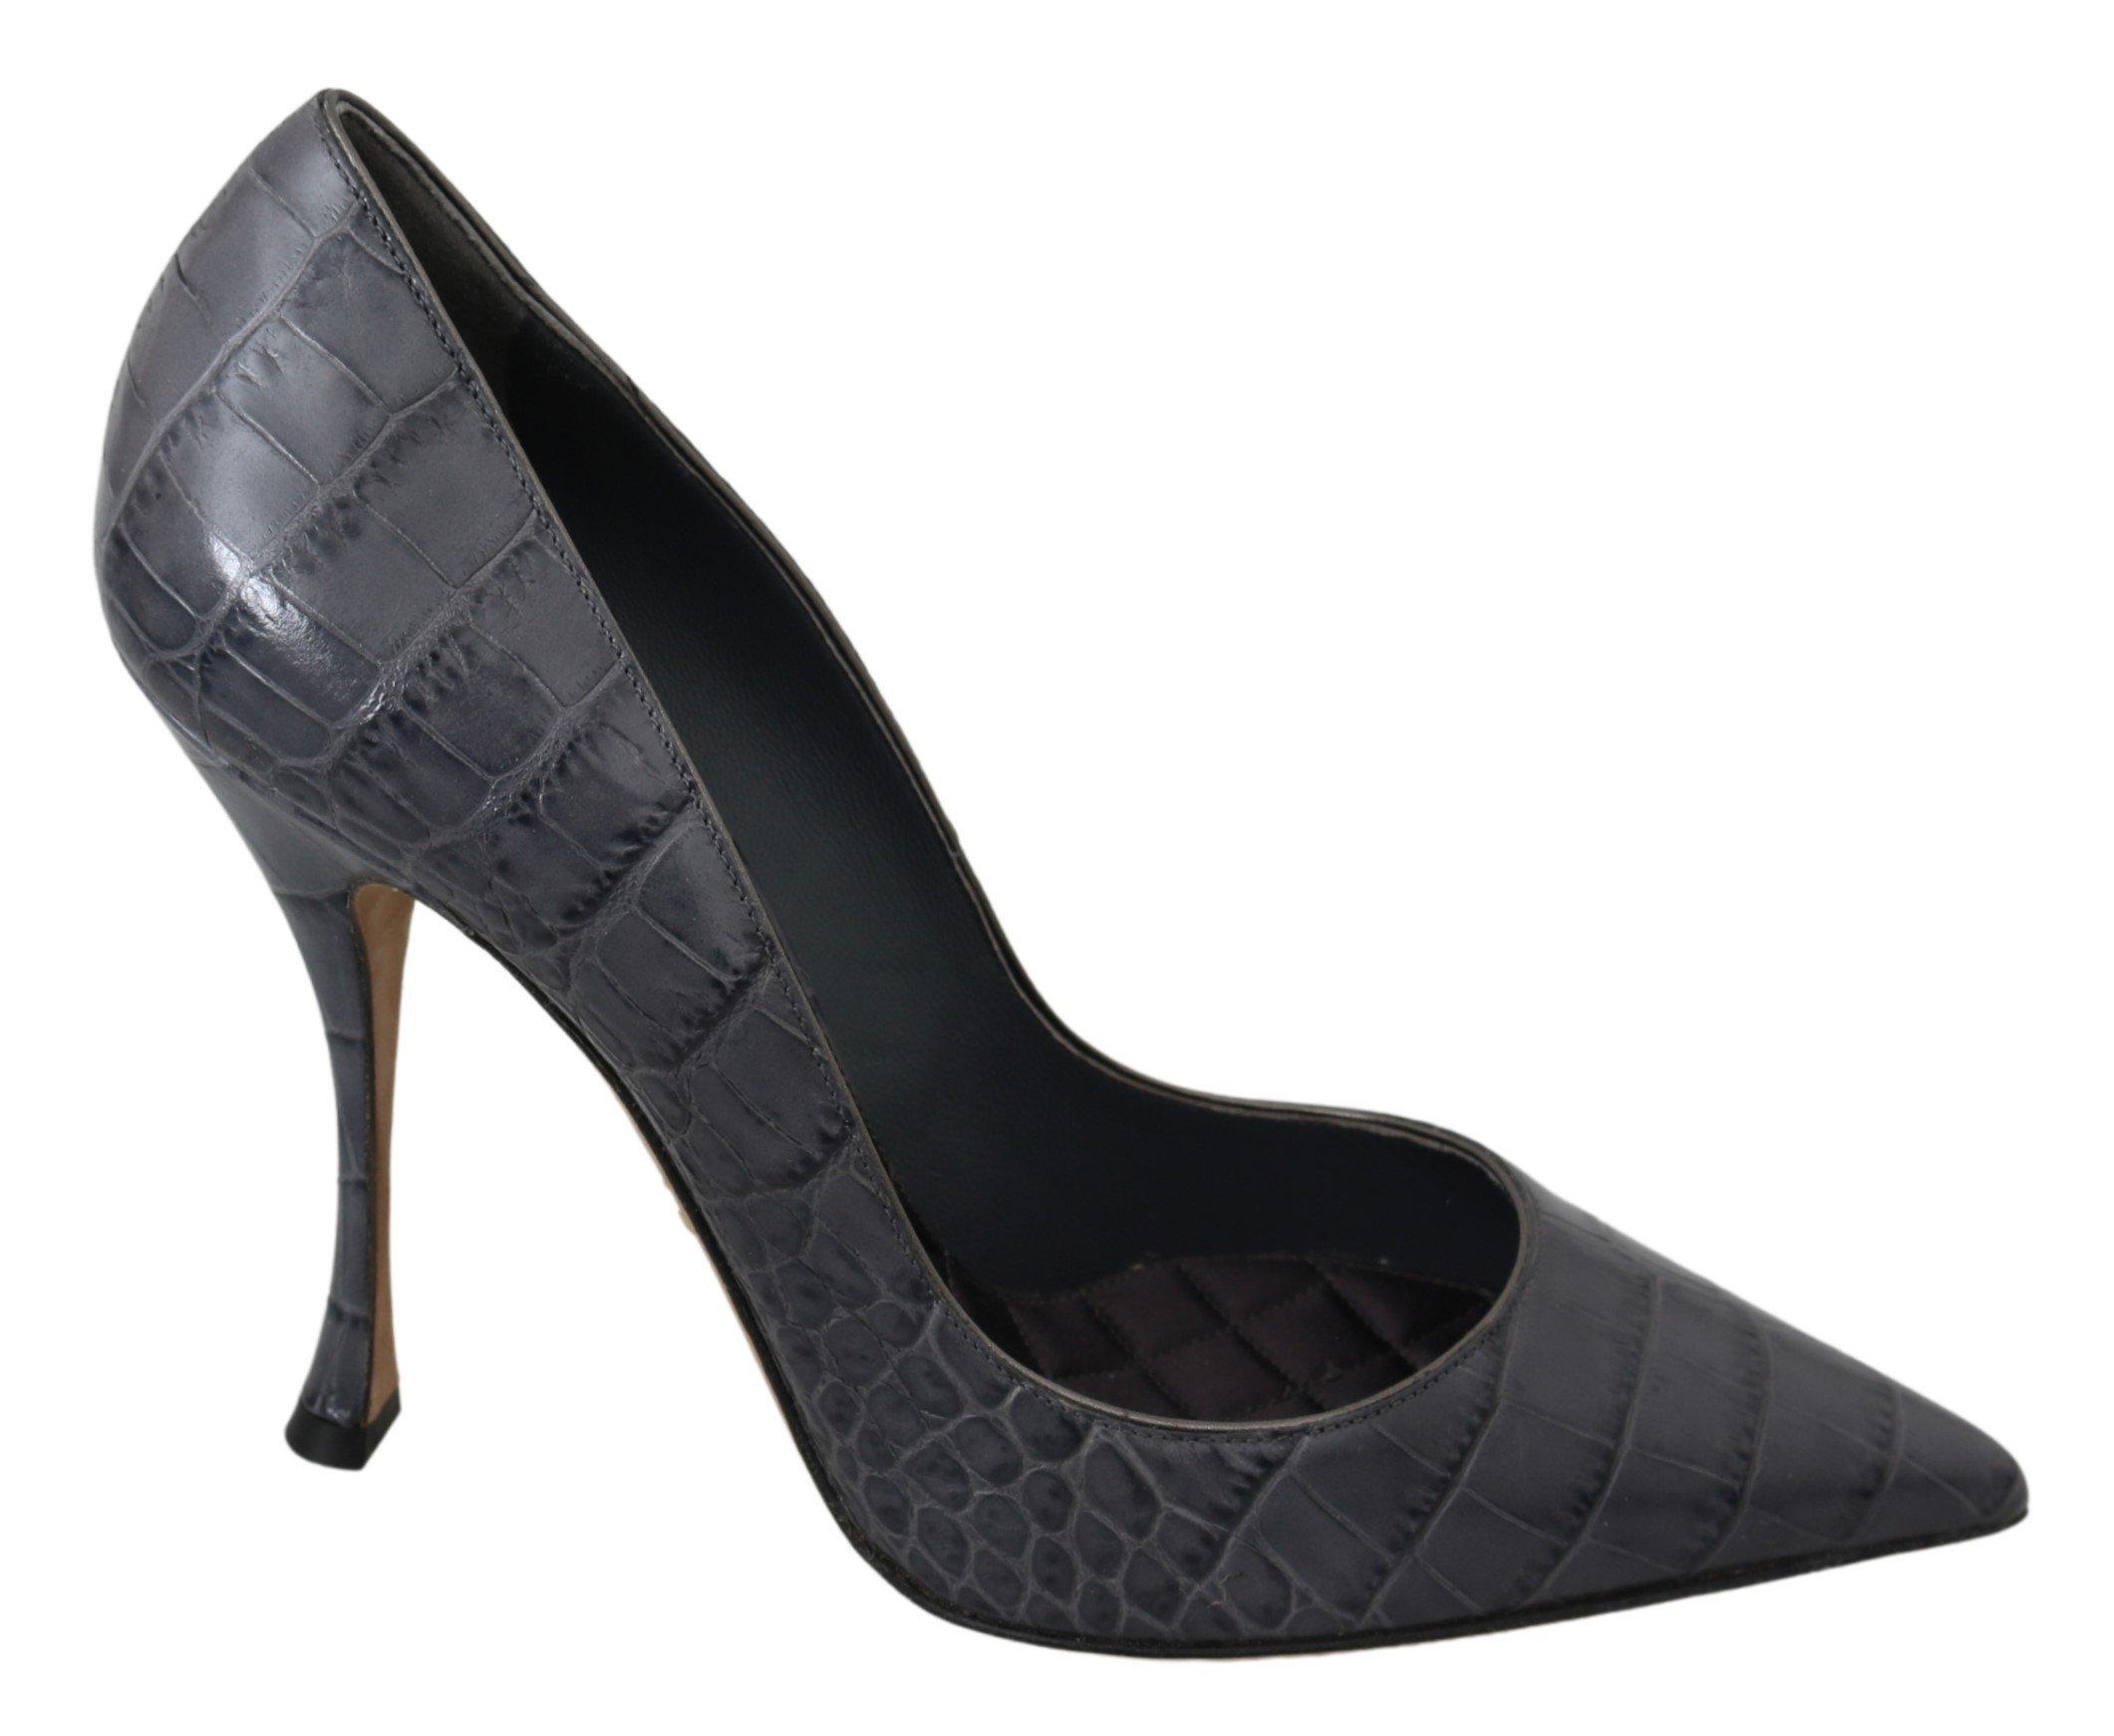 Dolce & Gabbana Women's Leather High Pumps Gray LA6898 - EU39/US8.5